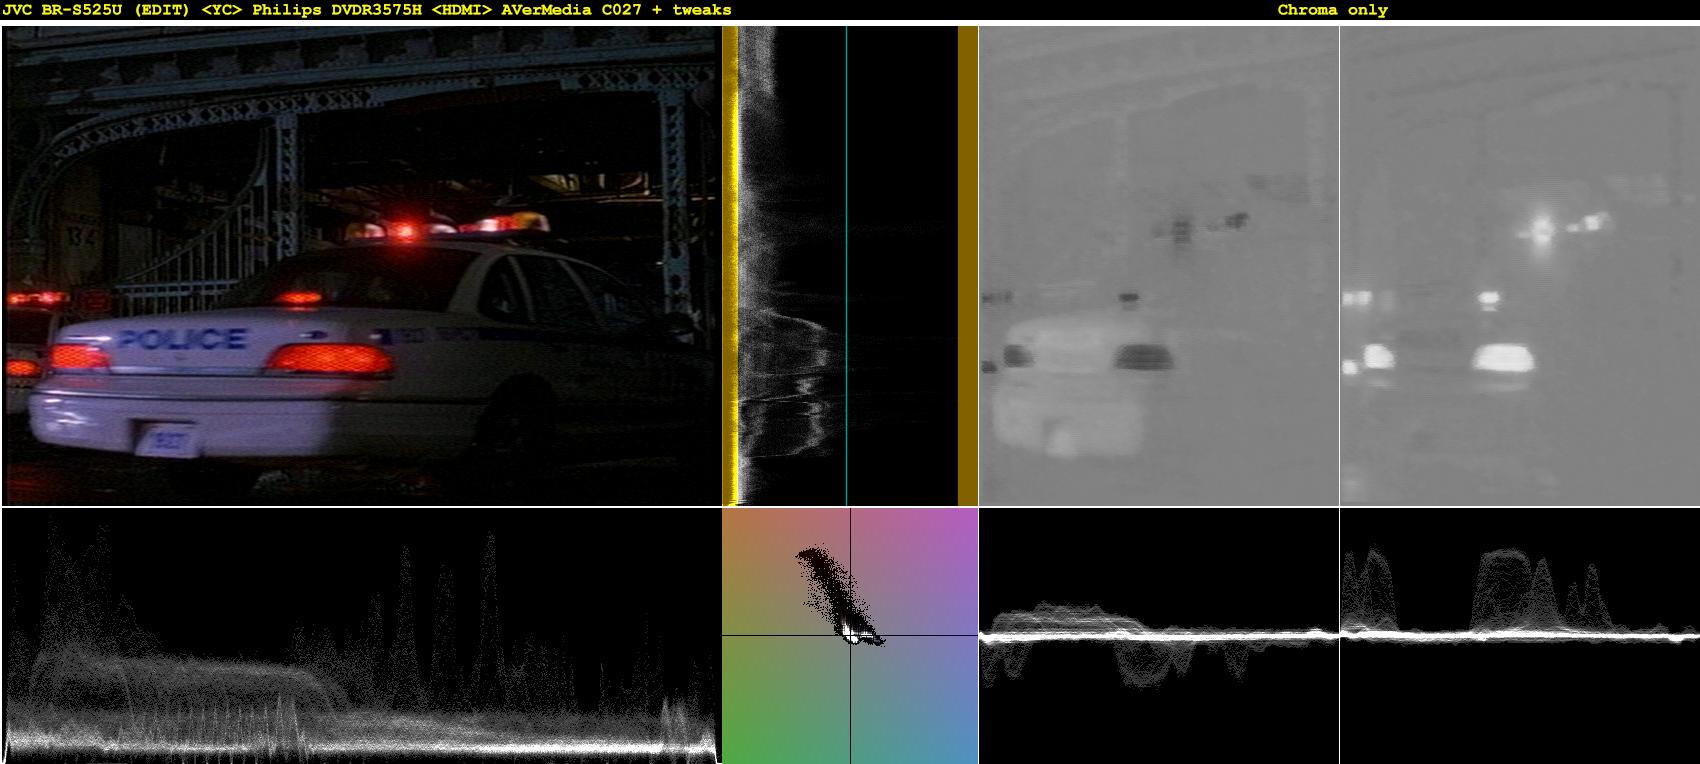 Click image for larger version  Name:0-55-31 - JVC BR-S525U (EDIT).png Views:1071 Size:862.7 KB ID:37676